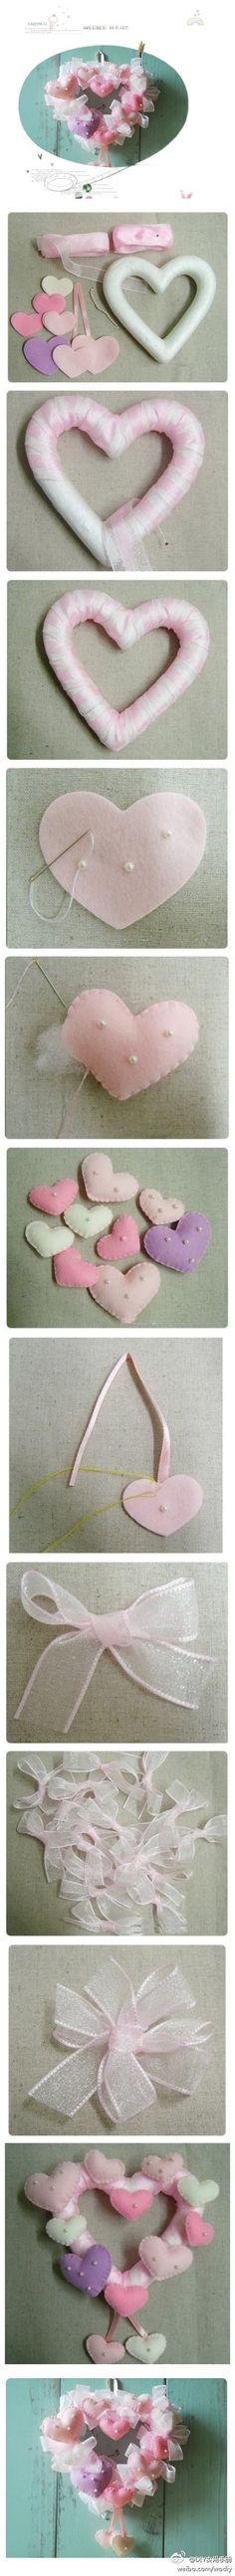 DIY Valentines idea